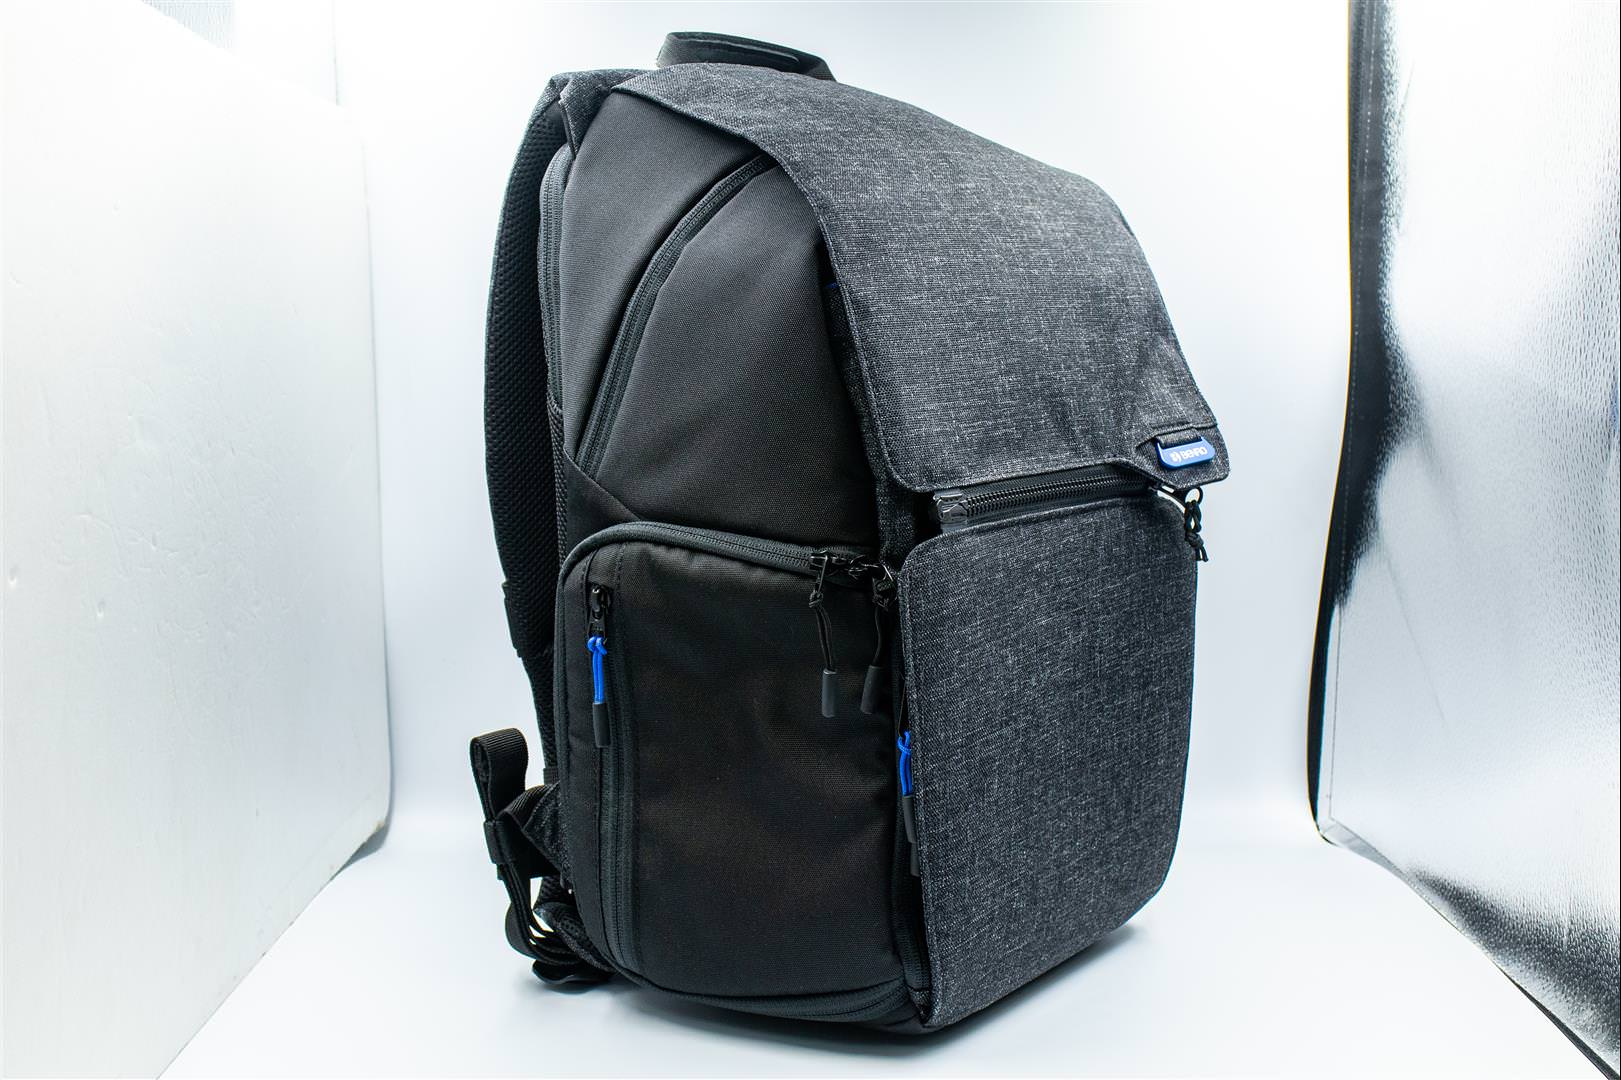 Benro Traveler-200